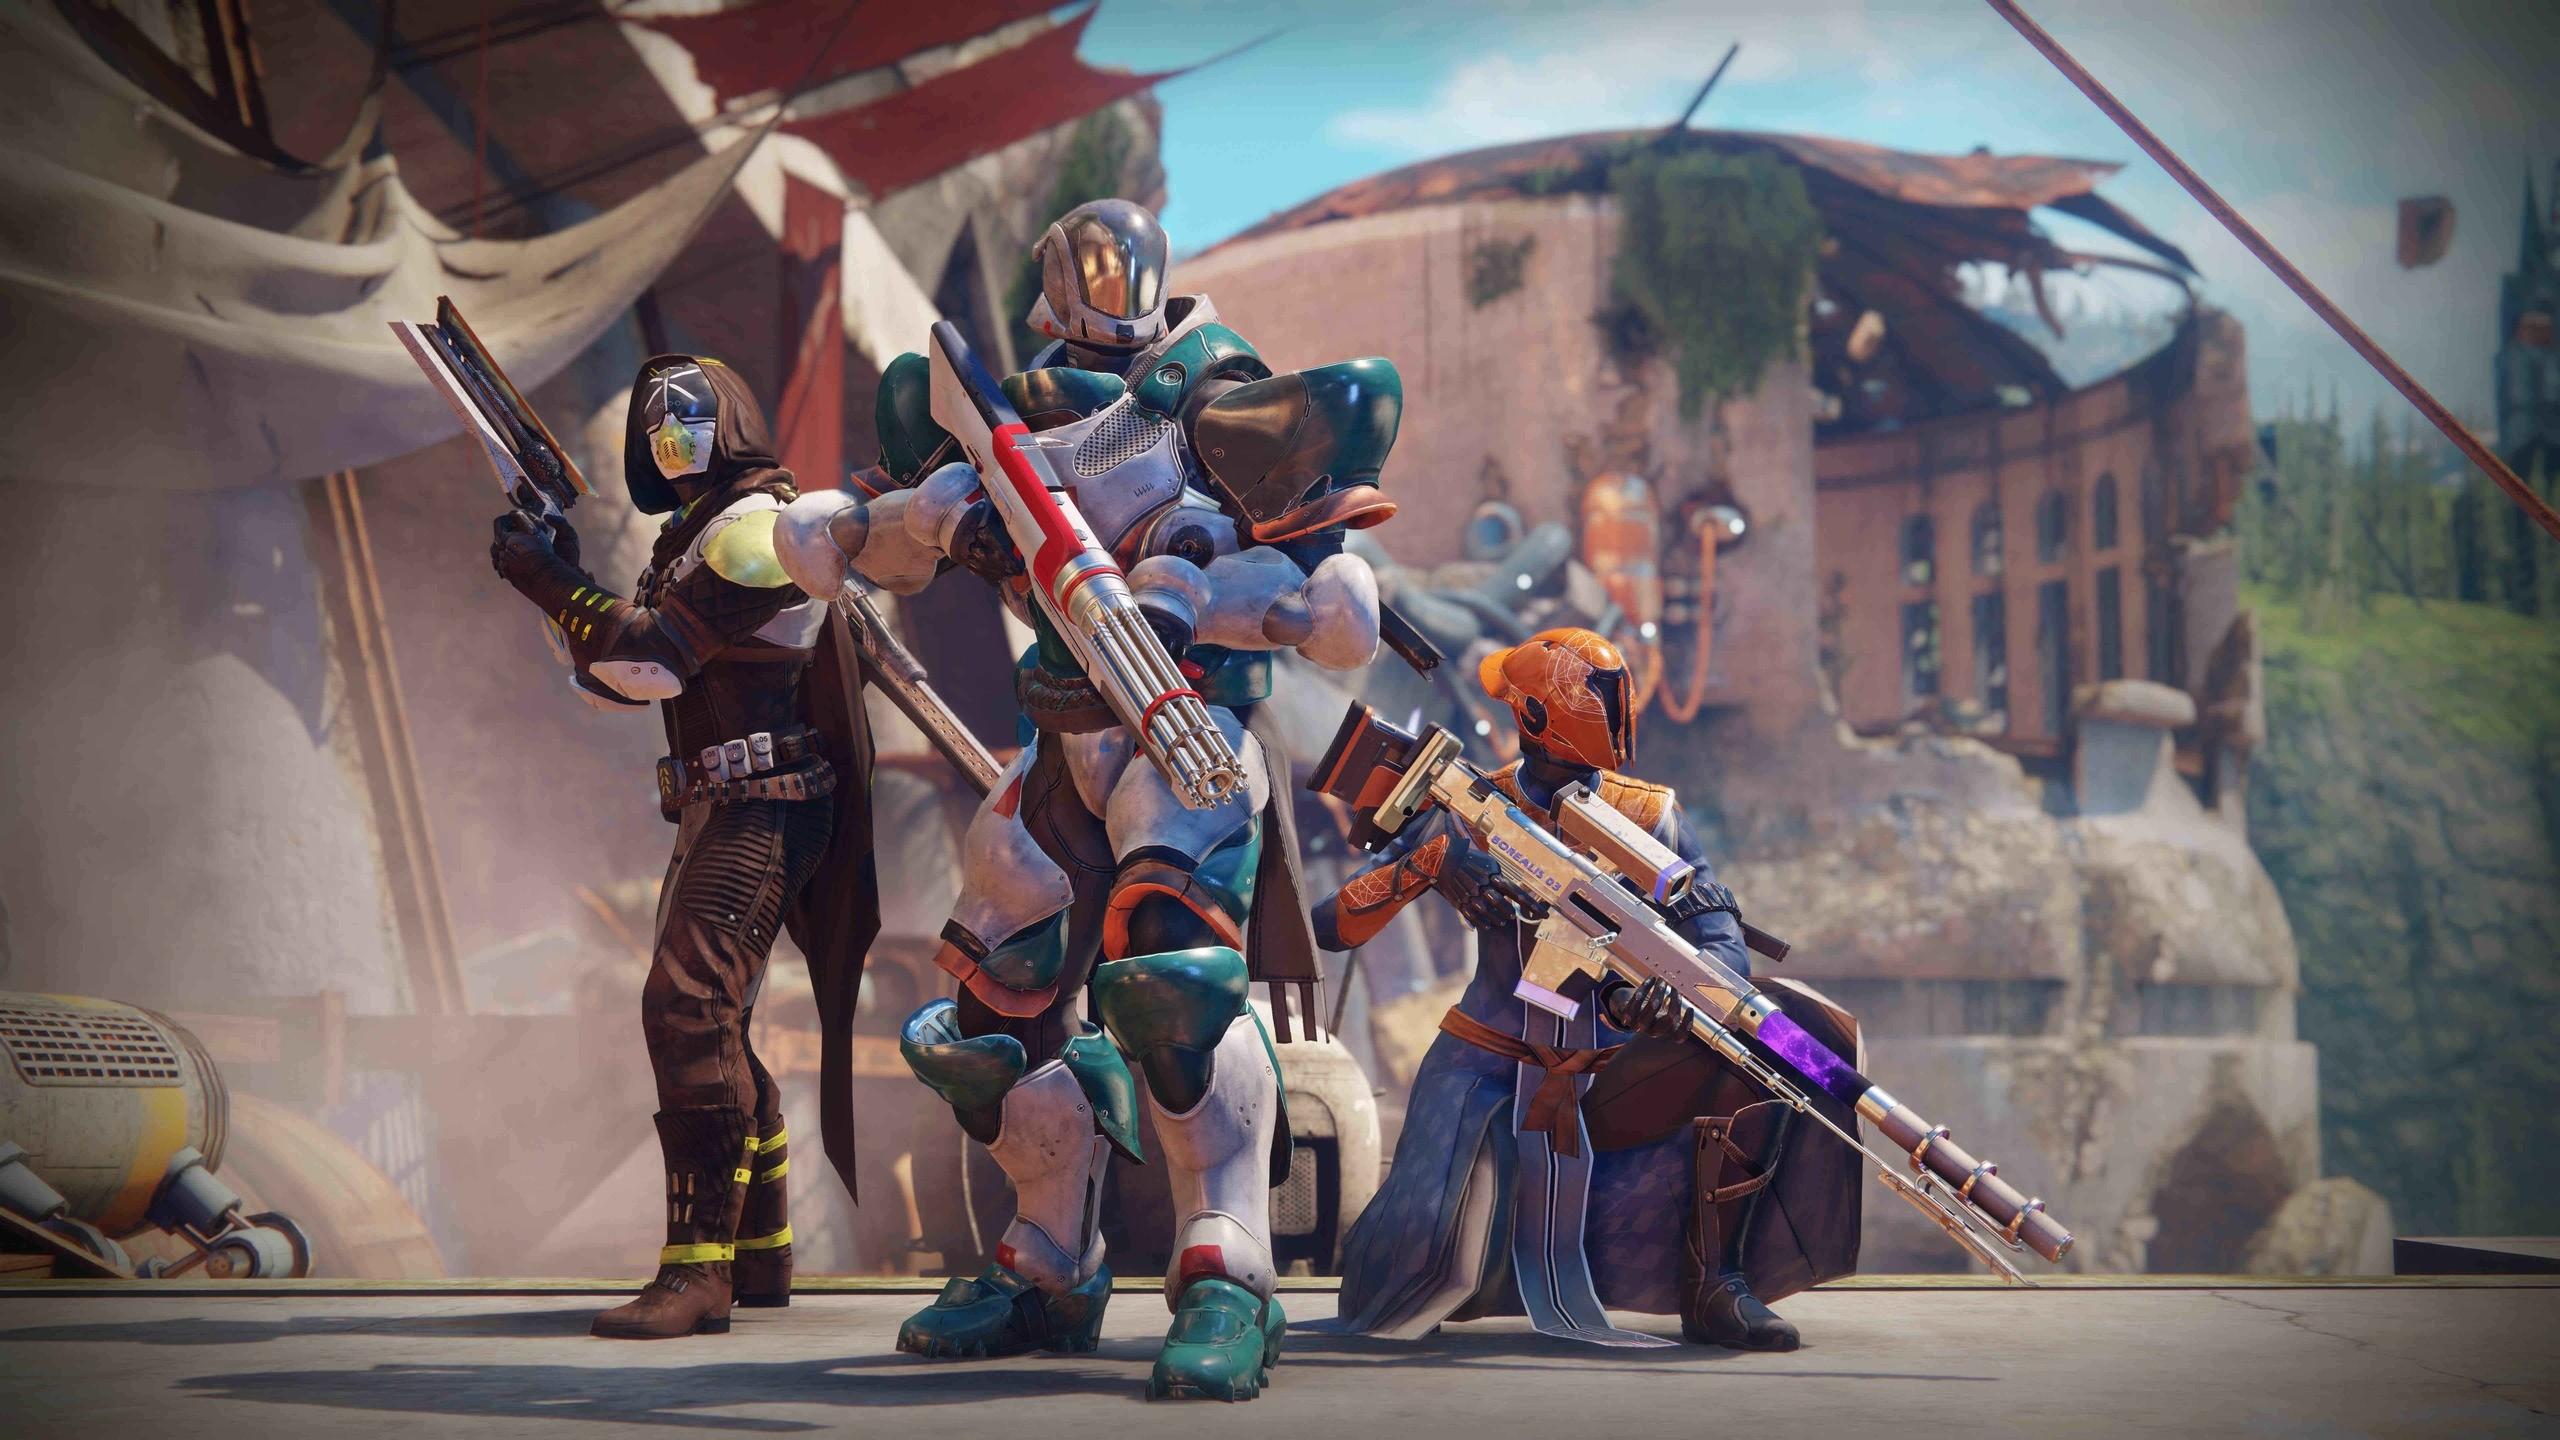 destiny-2-2017-game-dc.jpg